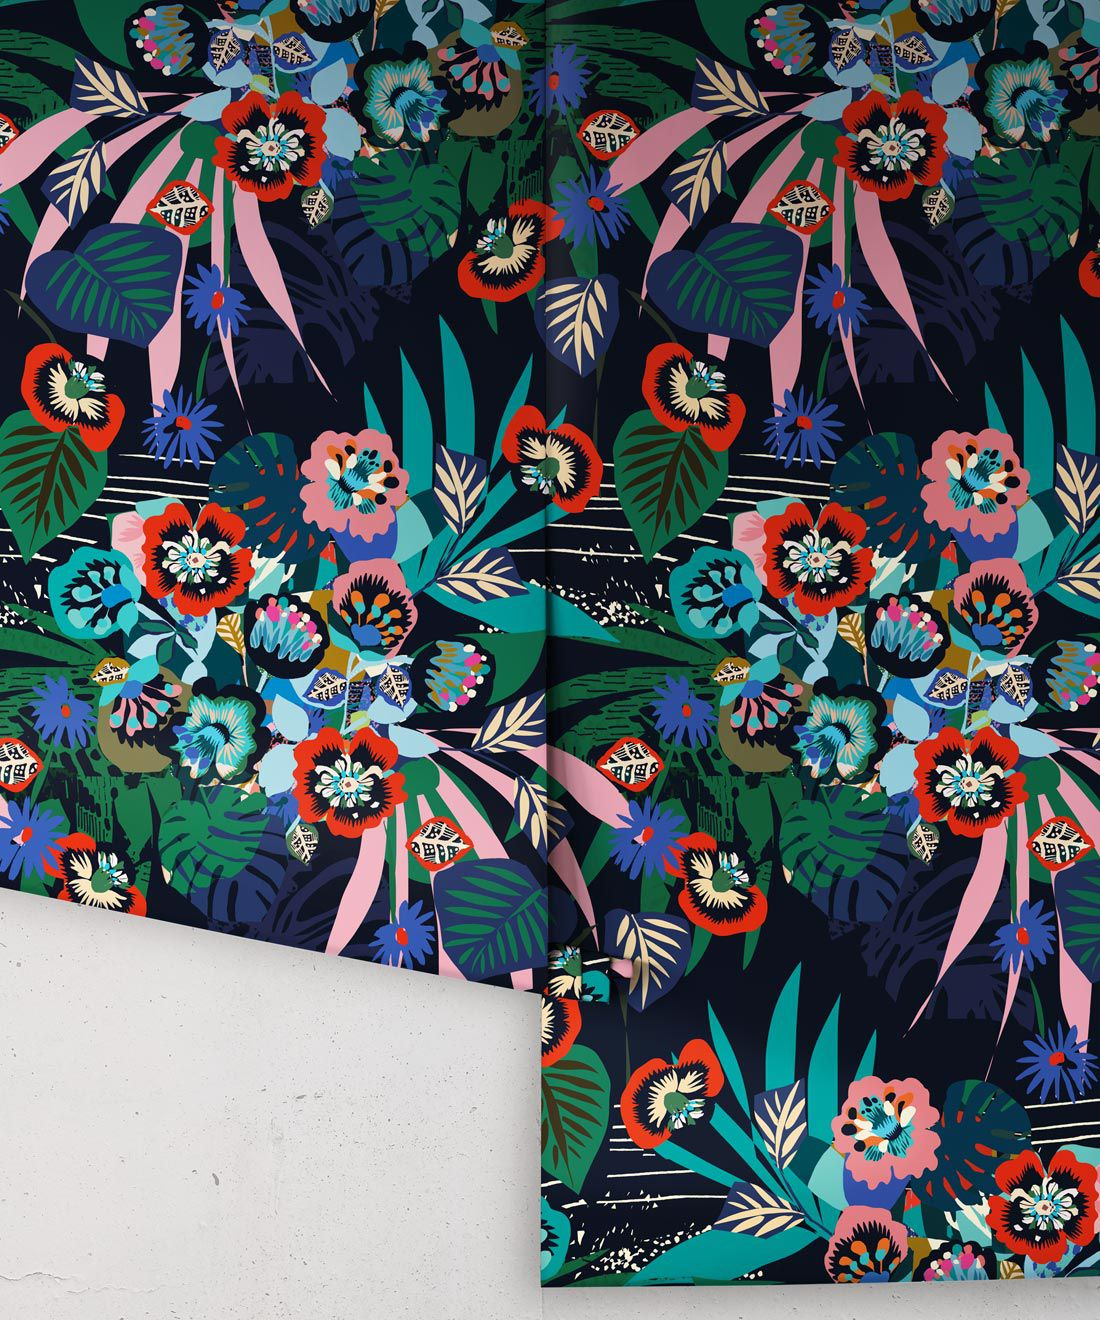 Kyoto Wallpaper • Kimono Wallpaper • Japanese Wallpaper • Deep Colourful Wallpaper • Rolls